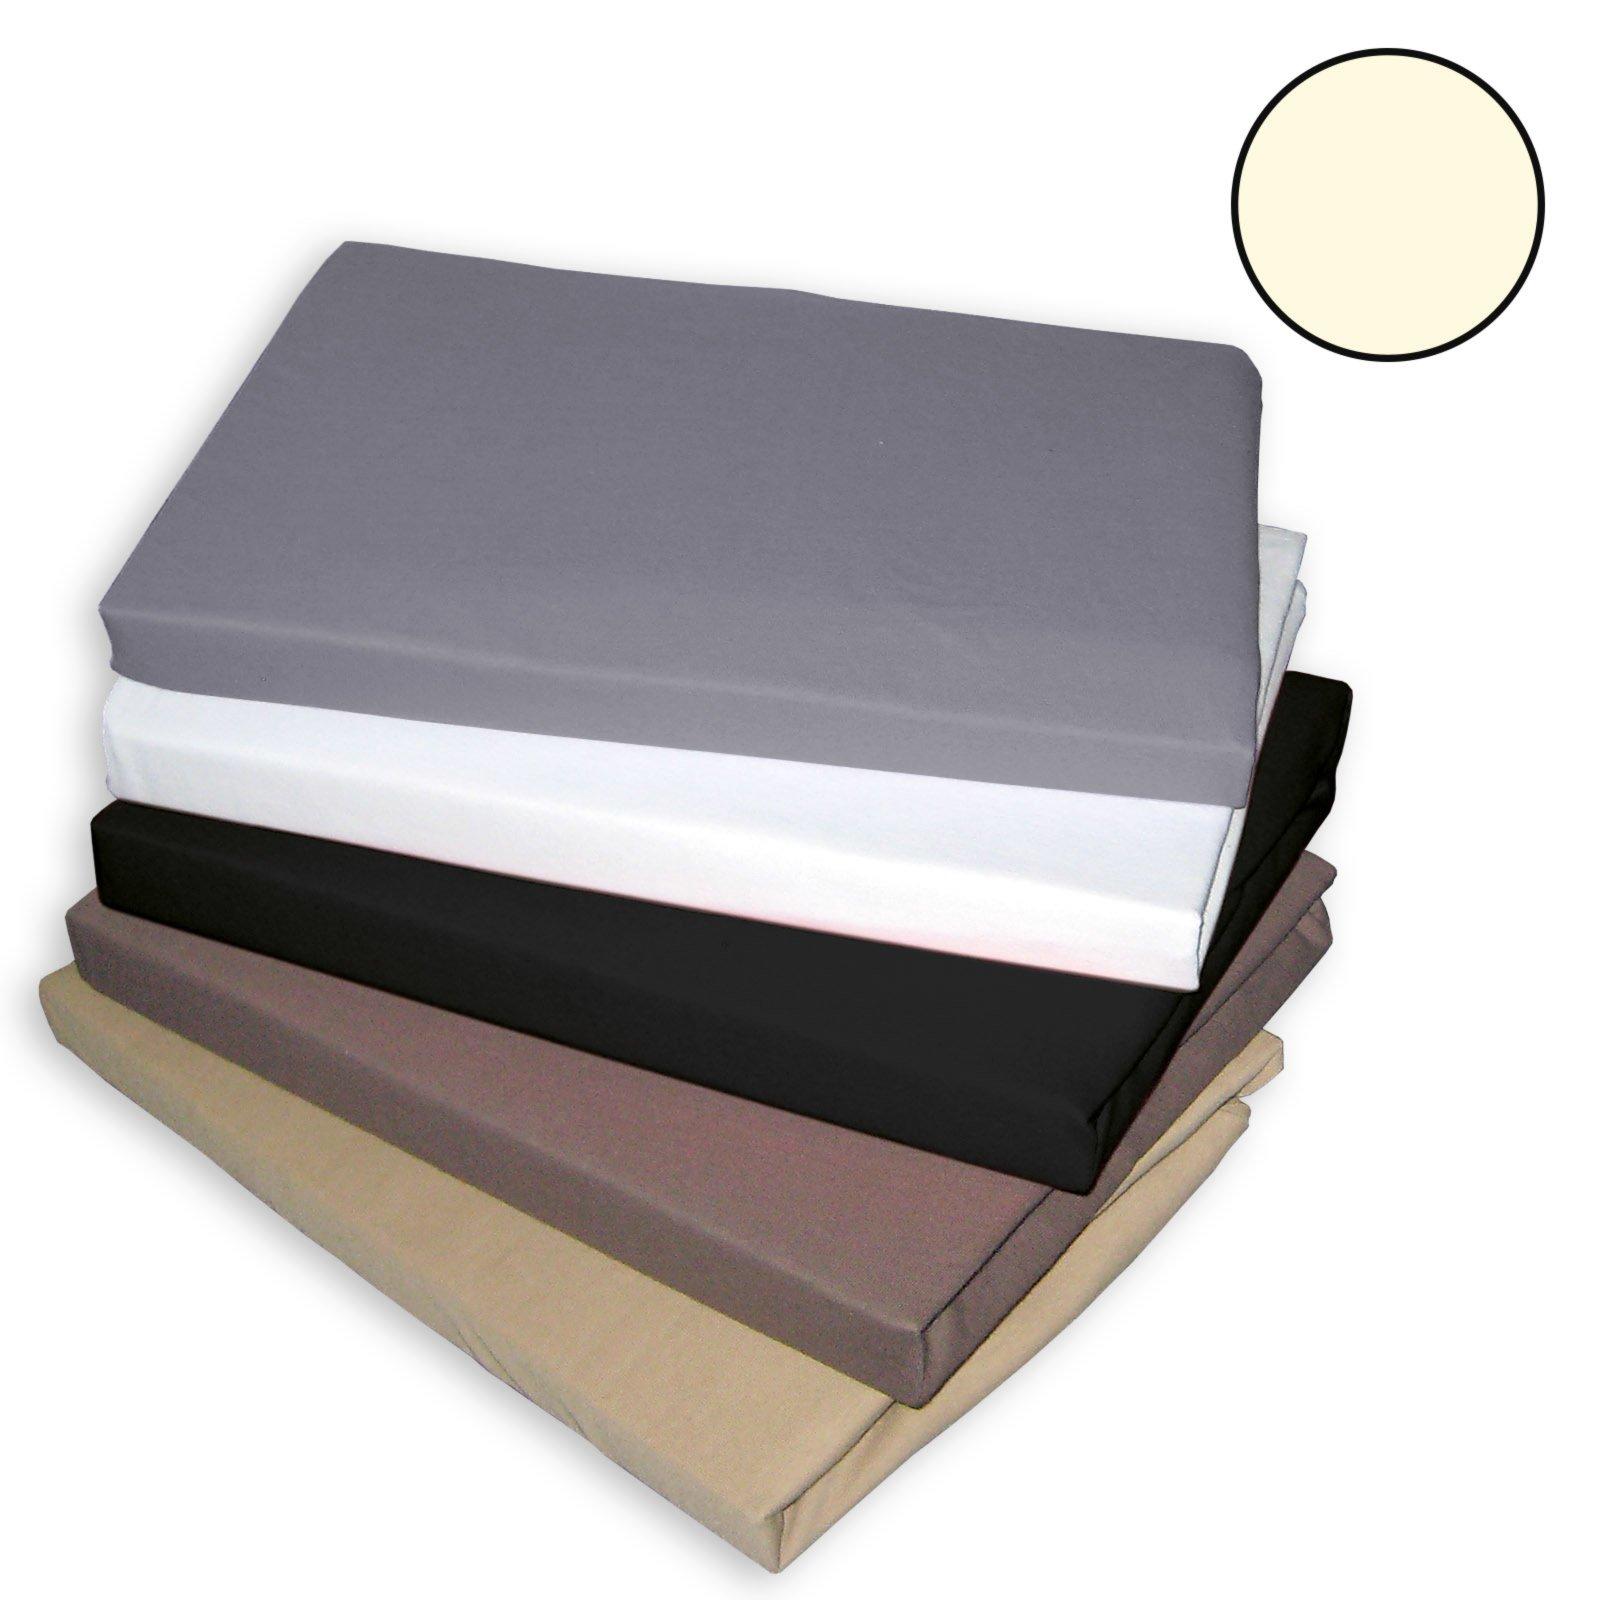 topper spannbettlaken traumhaft gut ecru 100x200 cm. Black Bedroom Furniture Sets. Home Design Ideas